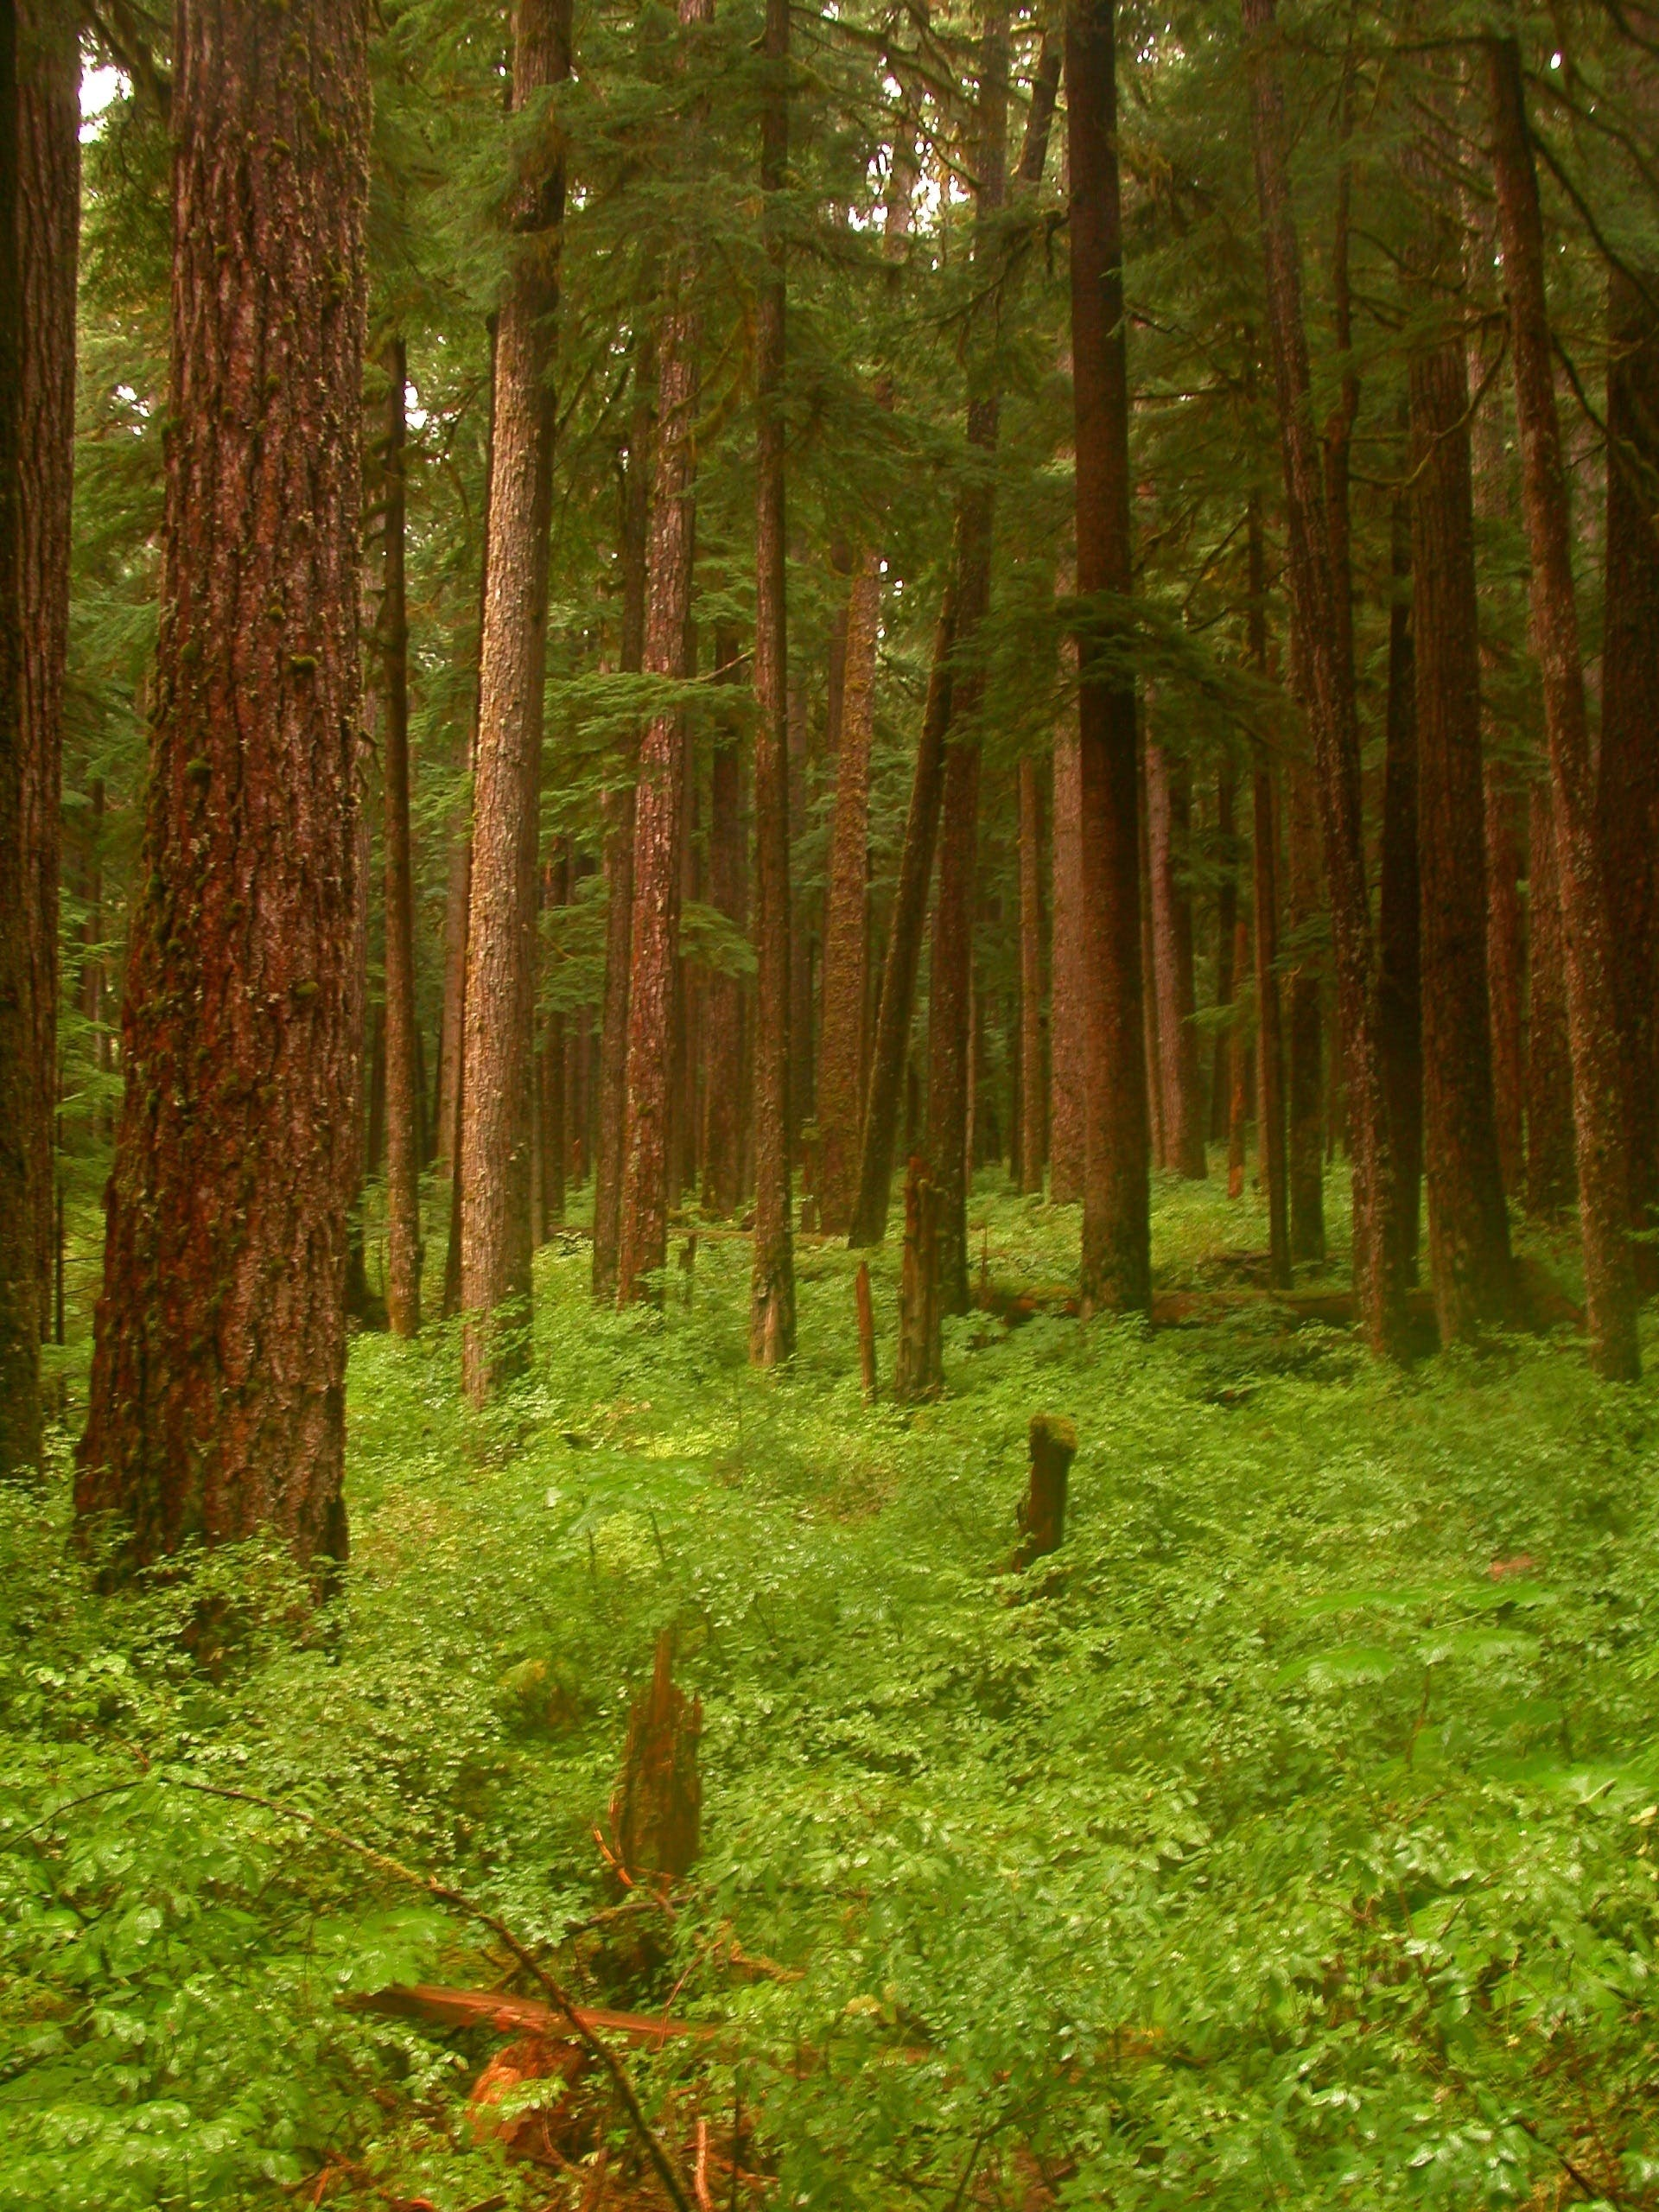 Free stock photo of nature, trees, usa, green